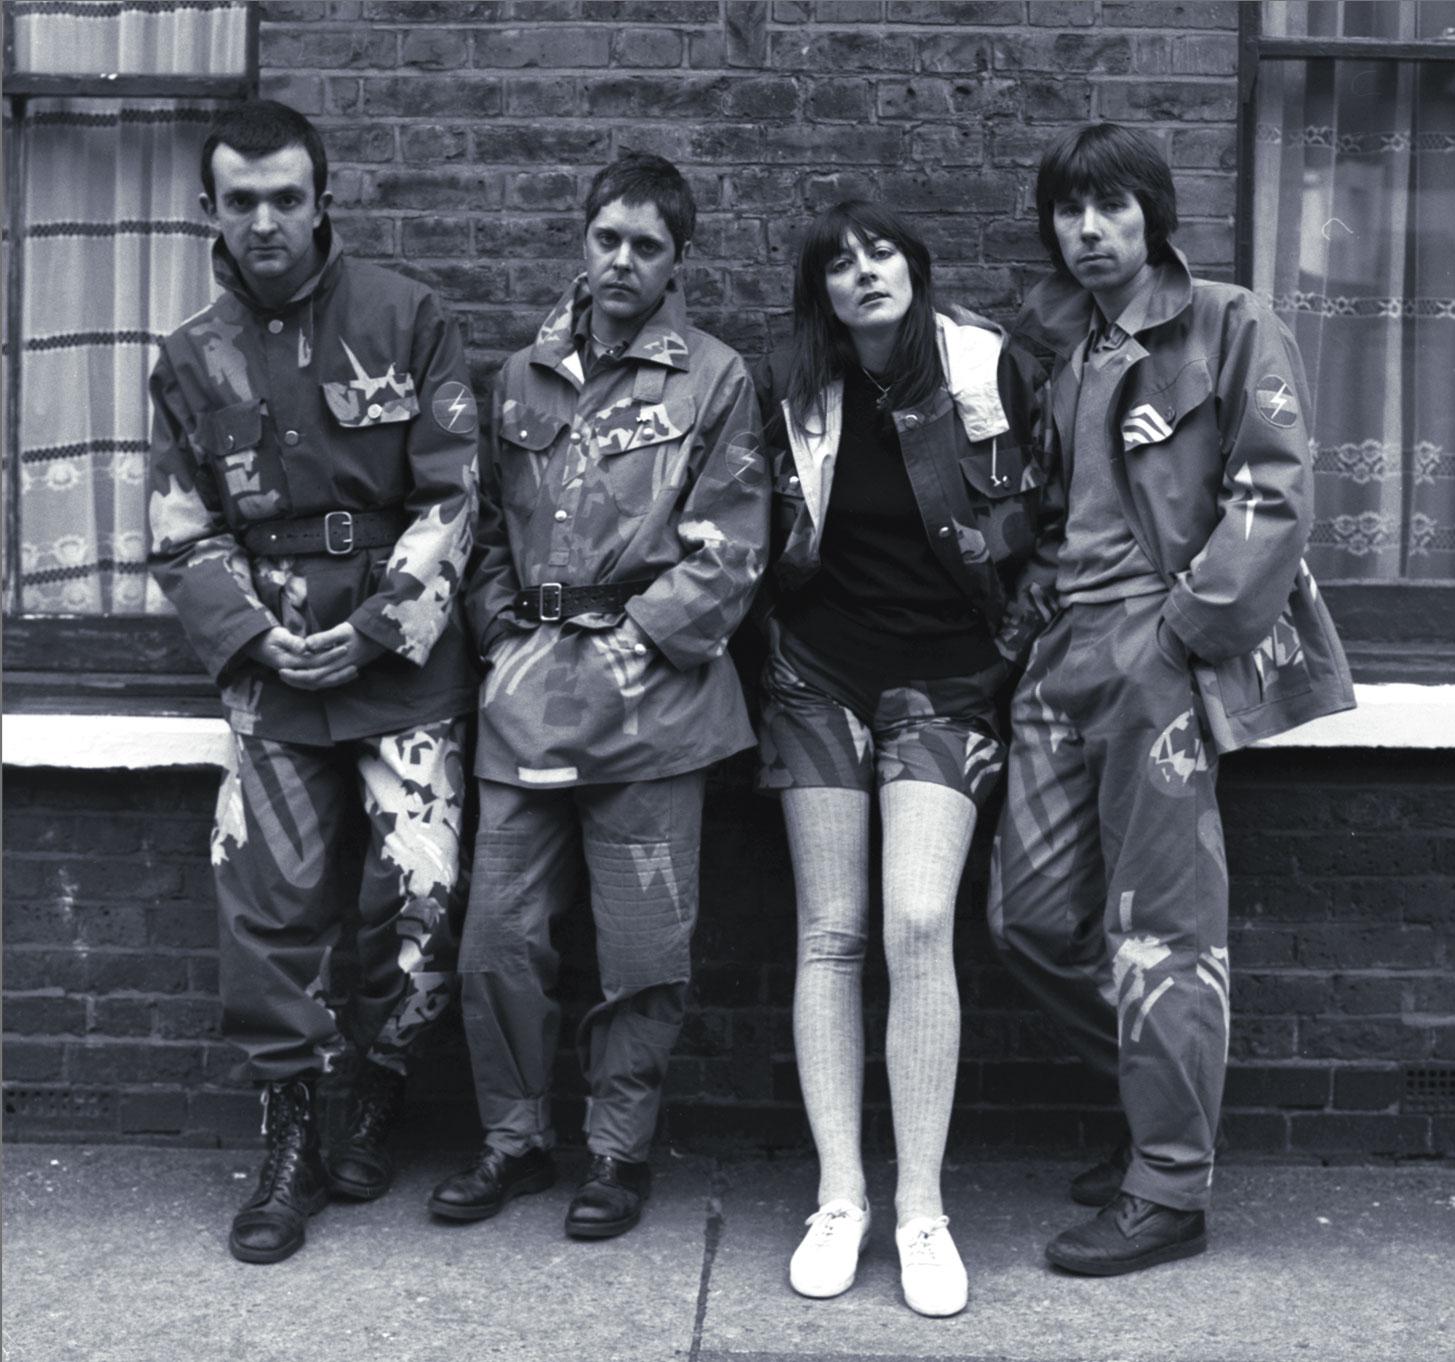 Throbbing Gristle - At Sheffield University 10th June 1980